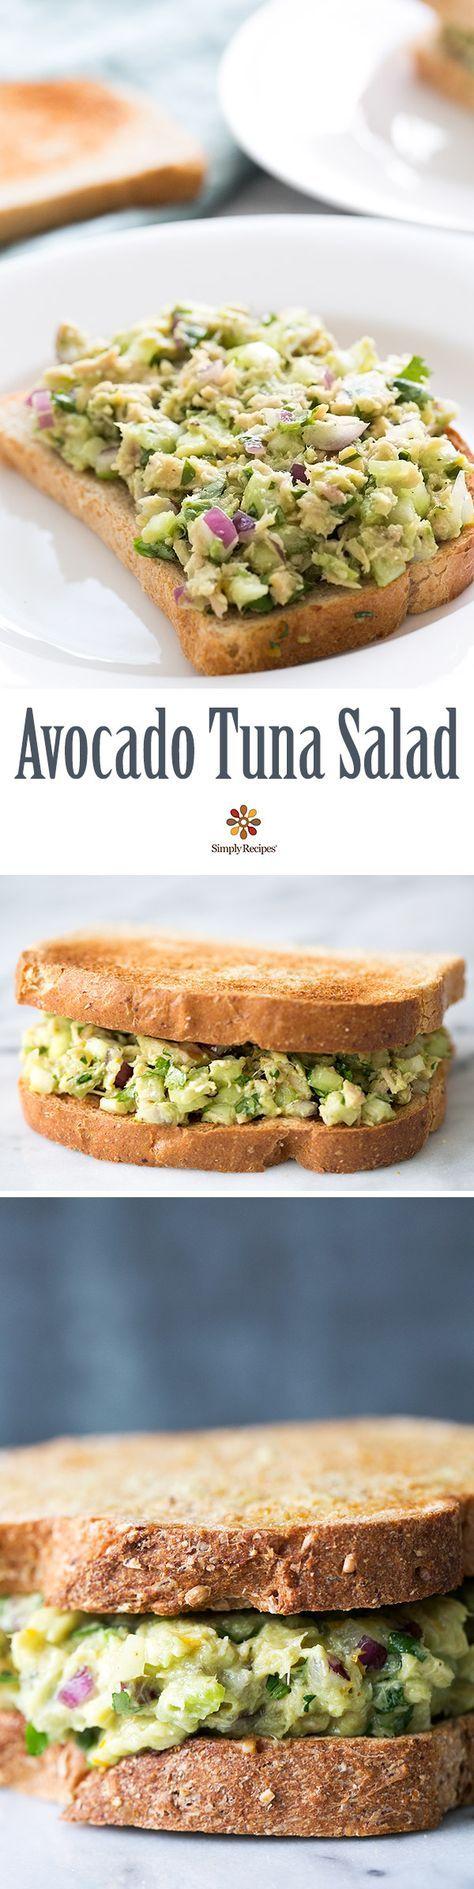 Avocado Tuna Salad ~ Healthy and easy! Avocado Tuna Salad with avocado, canned tuna, red onion, celery, and NO mayo. ~ SimplyRecipes.com